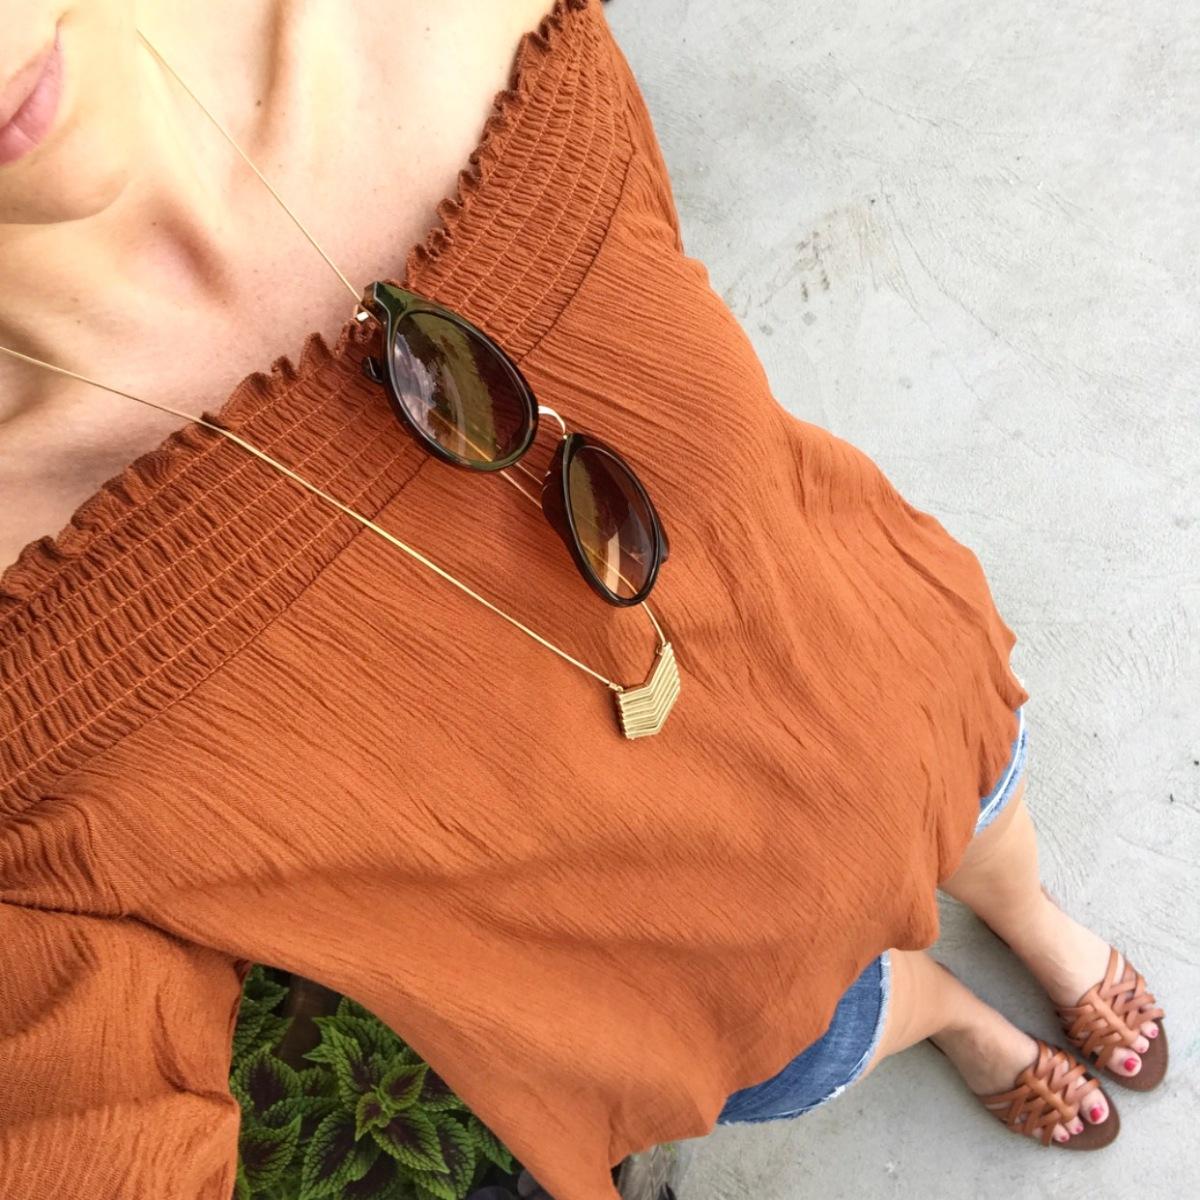 rust off the shoulder blouse |www.pearlsandsportsbras.com|